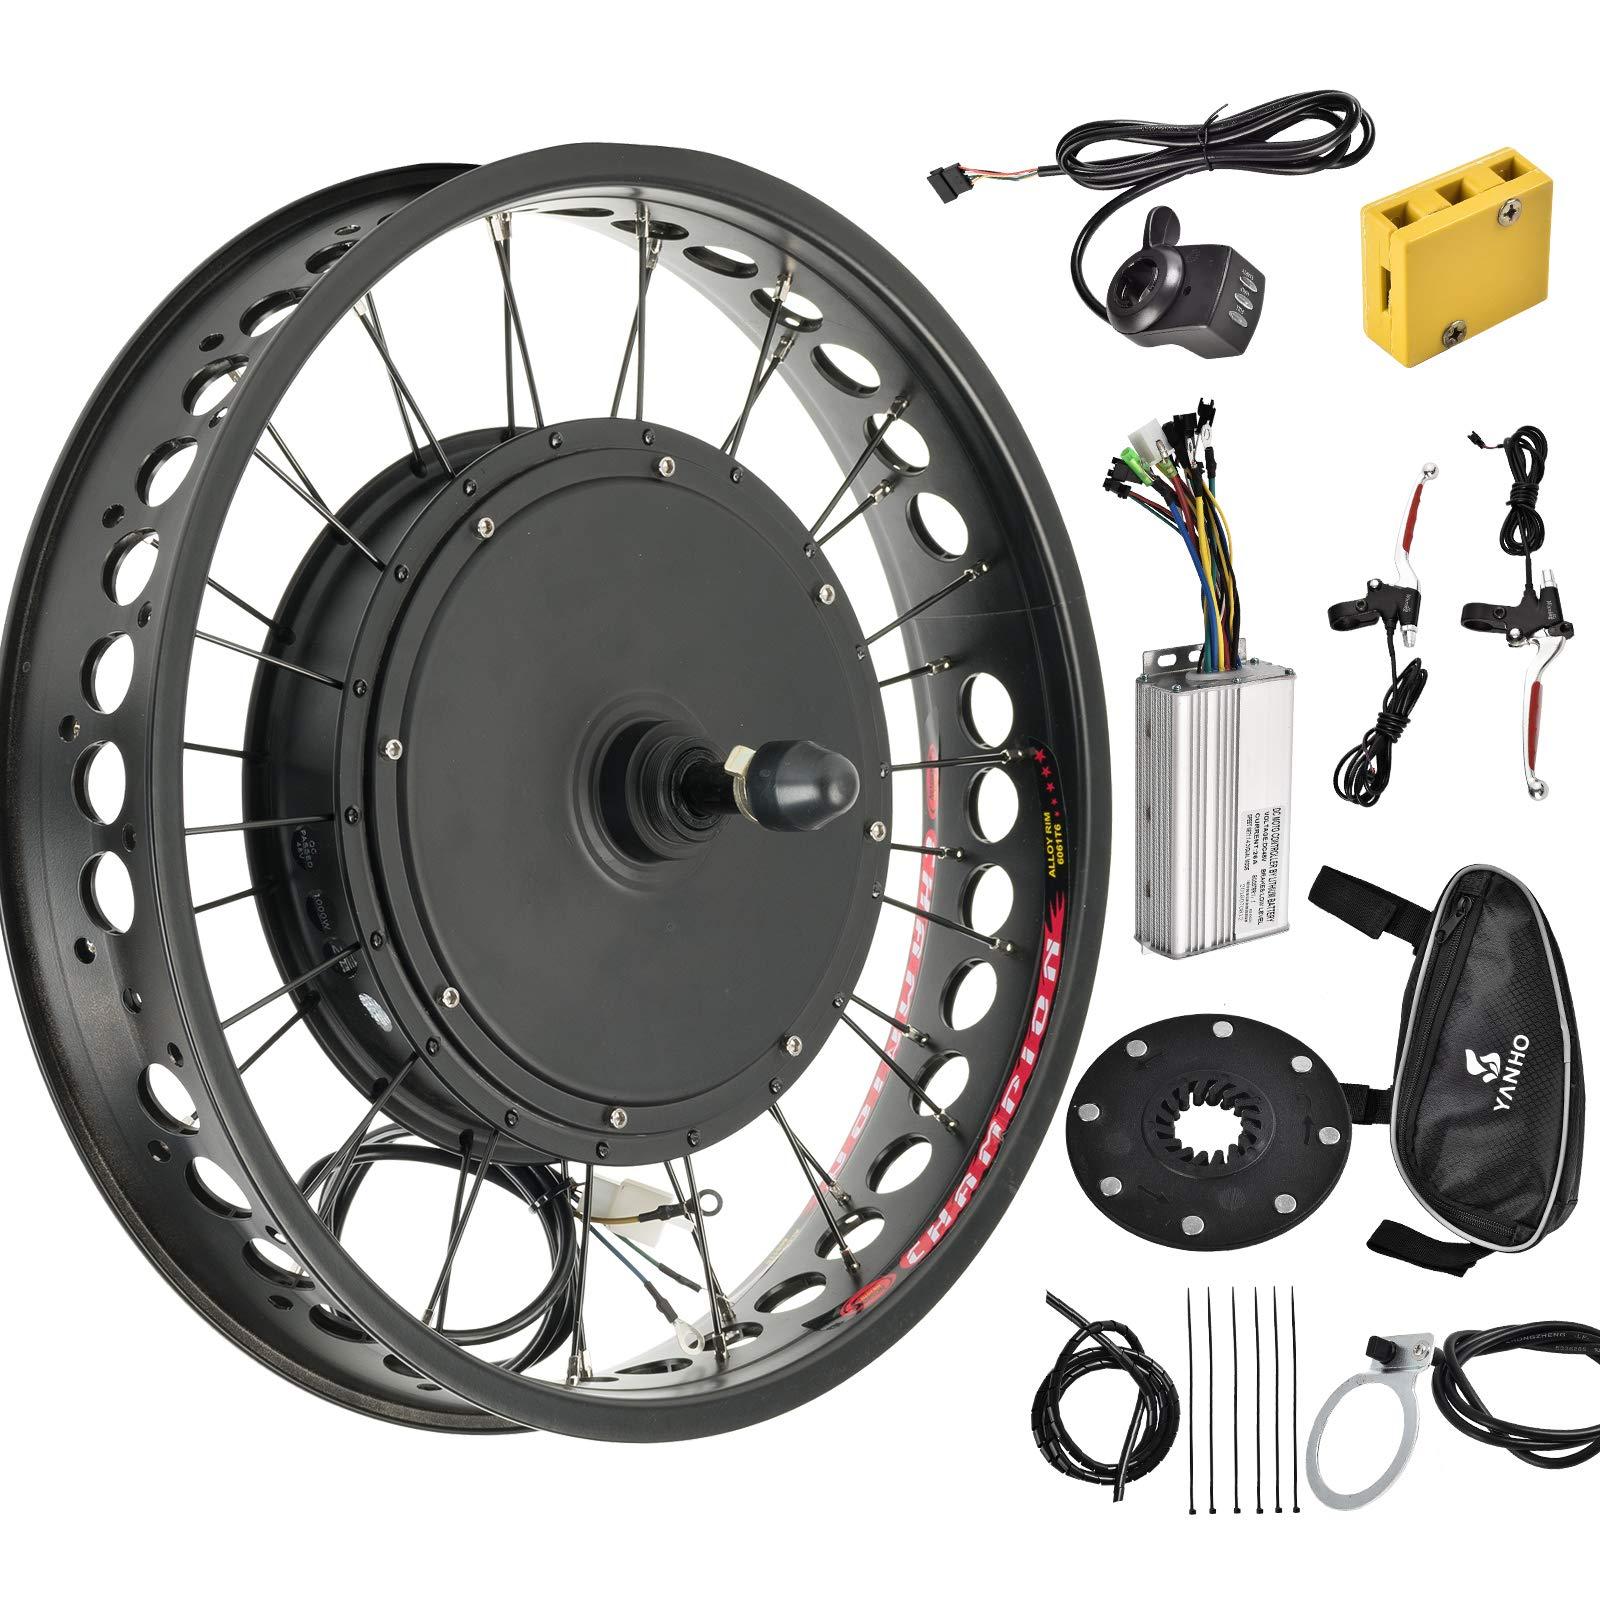 Murtisol Electric E-Bike Motor Kit 20'' Fat Tire Rear Wheel 48V 1000W Bicycle Motor Conversion Kit